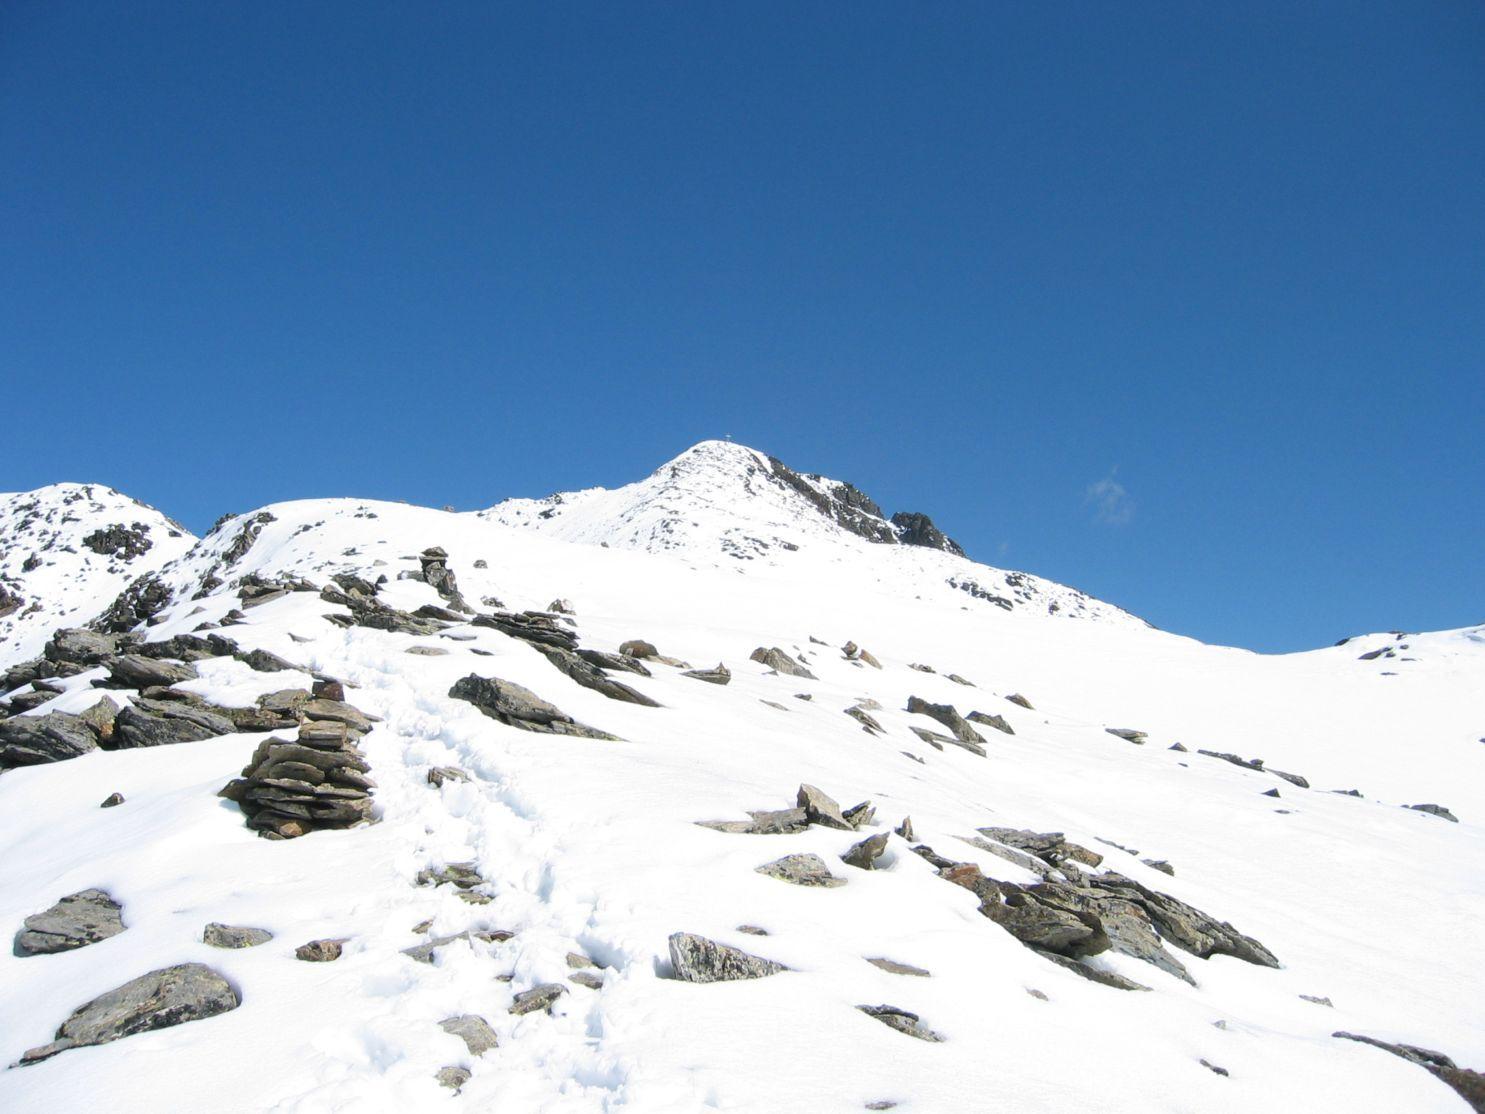 Foto: Gernot Huber / Wander Tour / Petzeck - höchster Gipfel der Schobergruppe (3283 m) / Gipfelanstieg / 11.12.2010 19:02:35